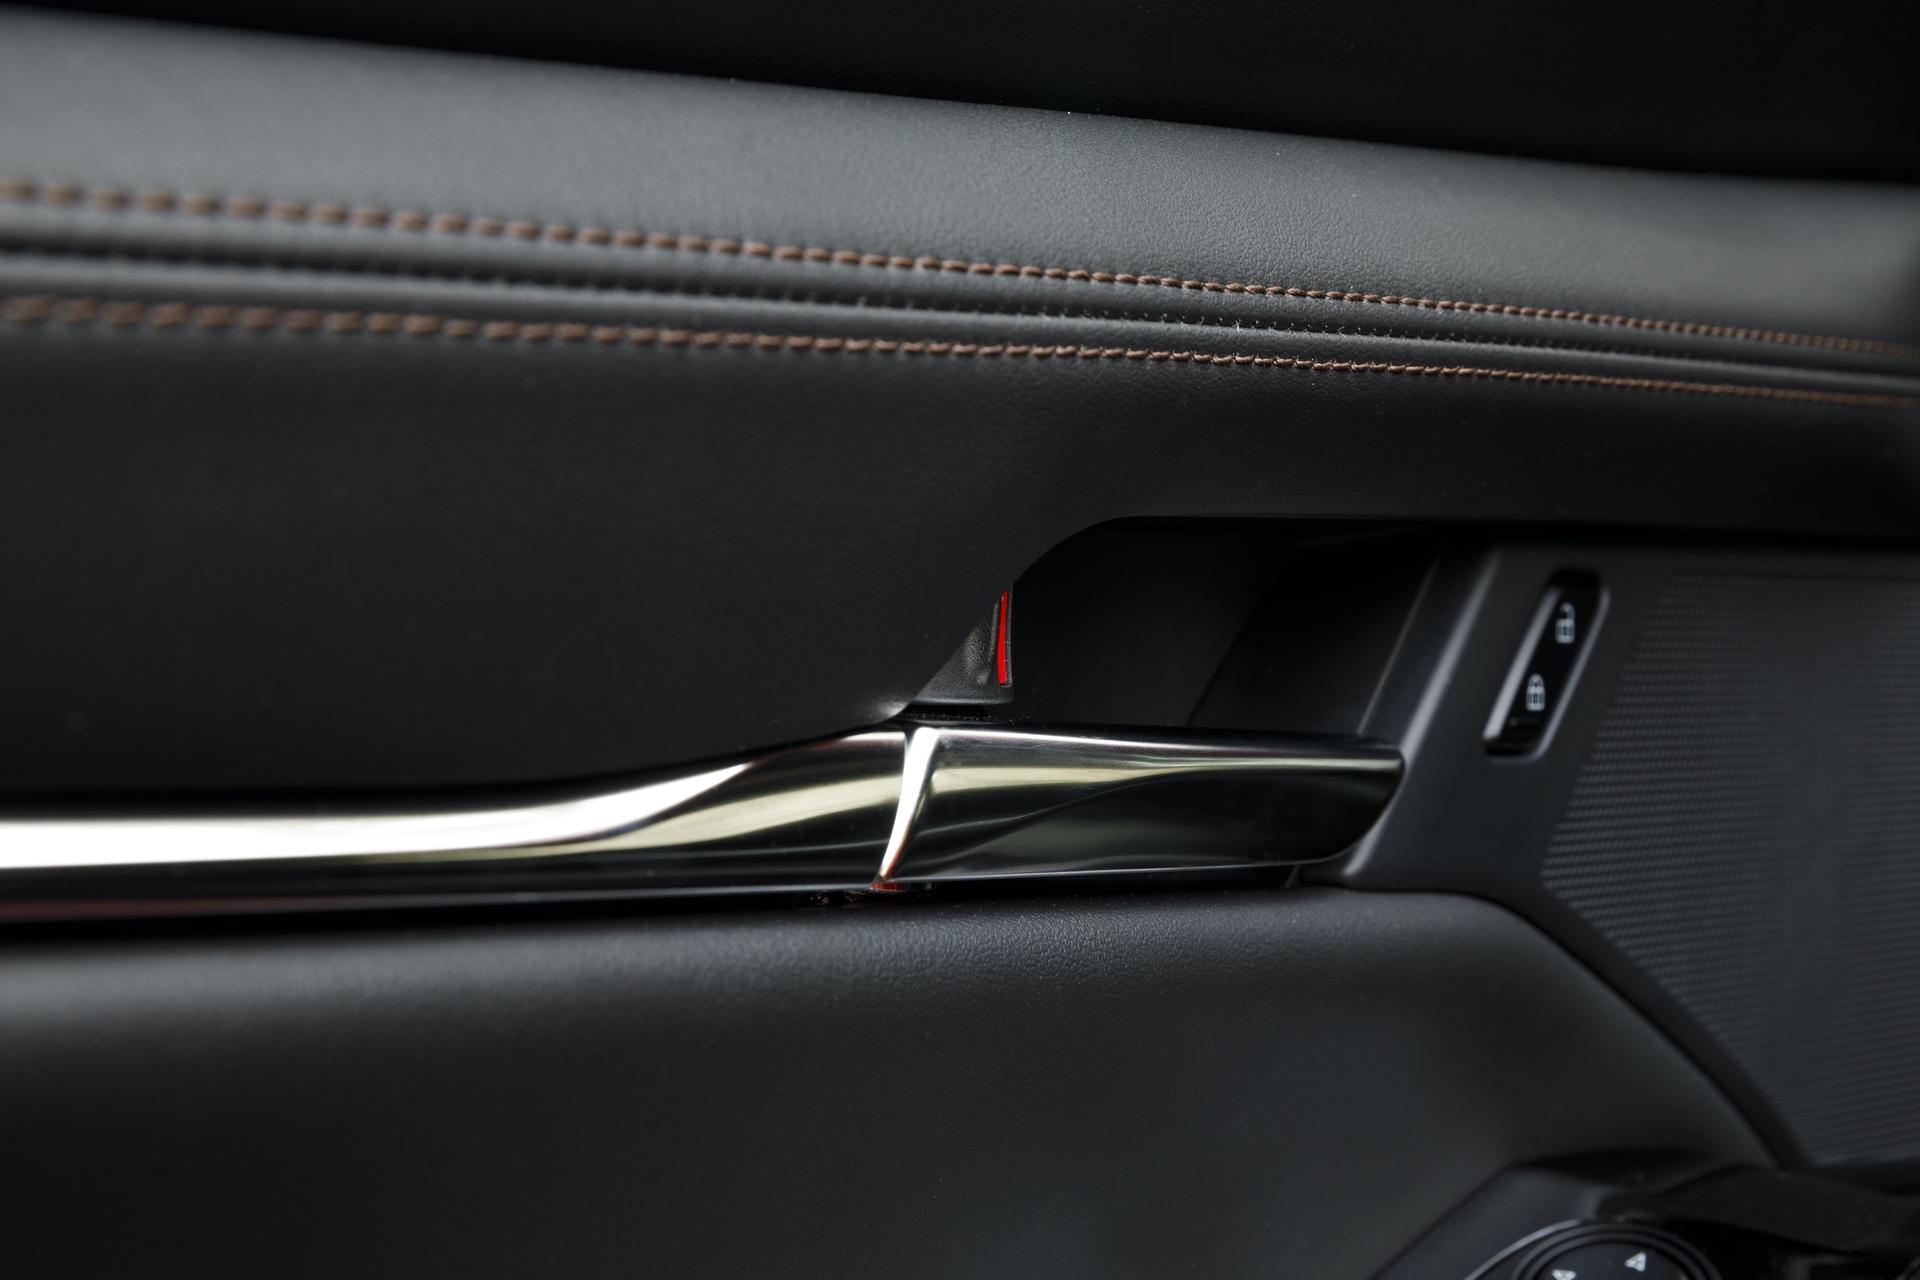 2019-Mazda3-Hatchback_35